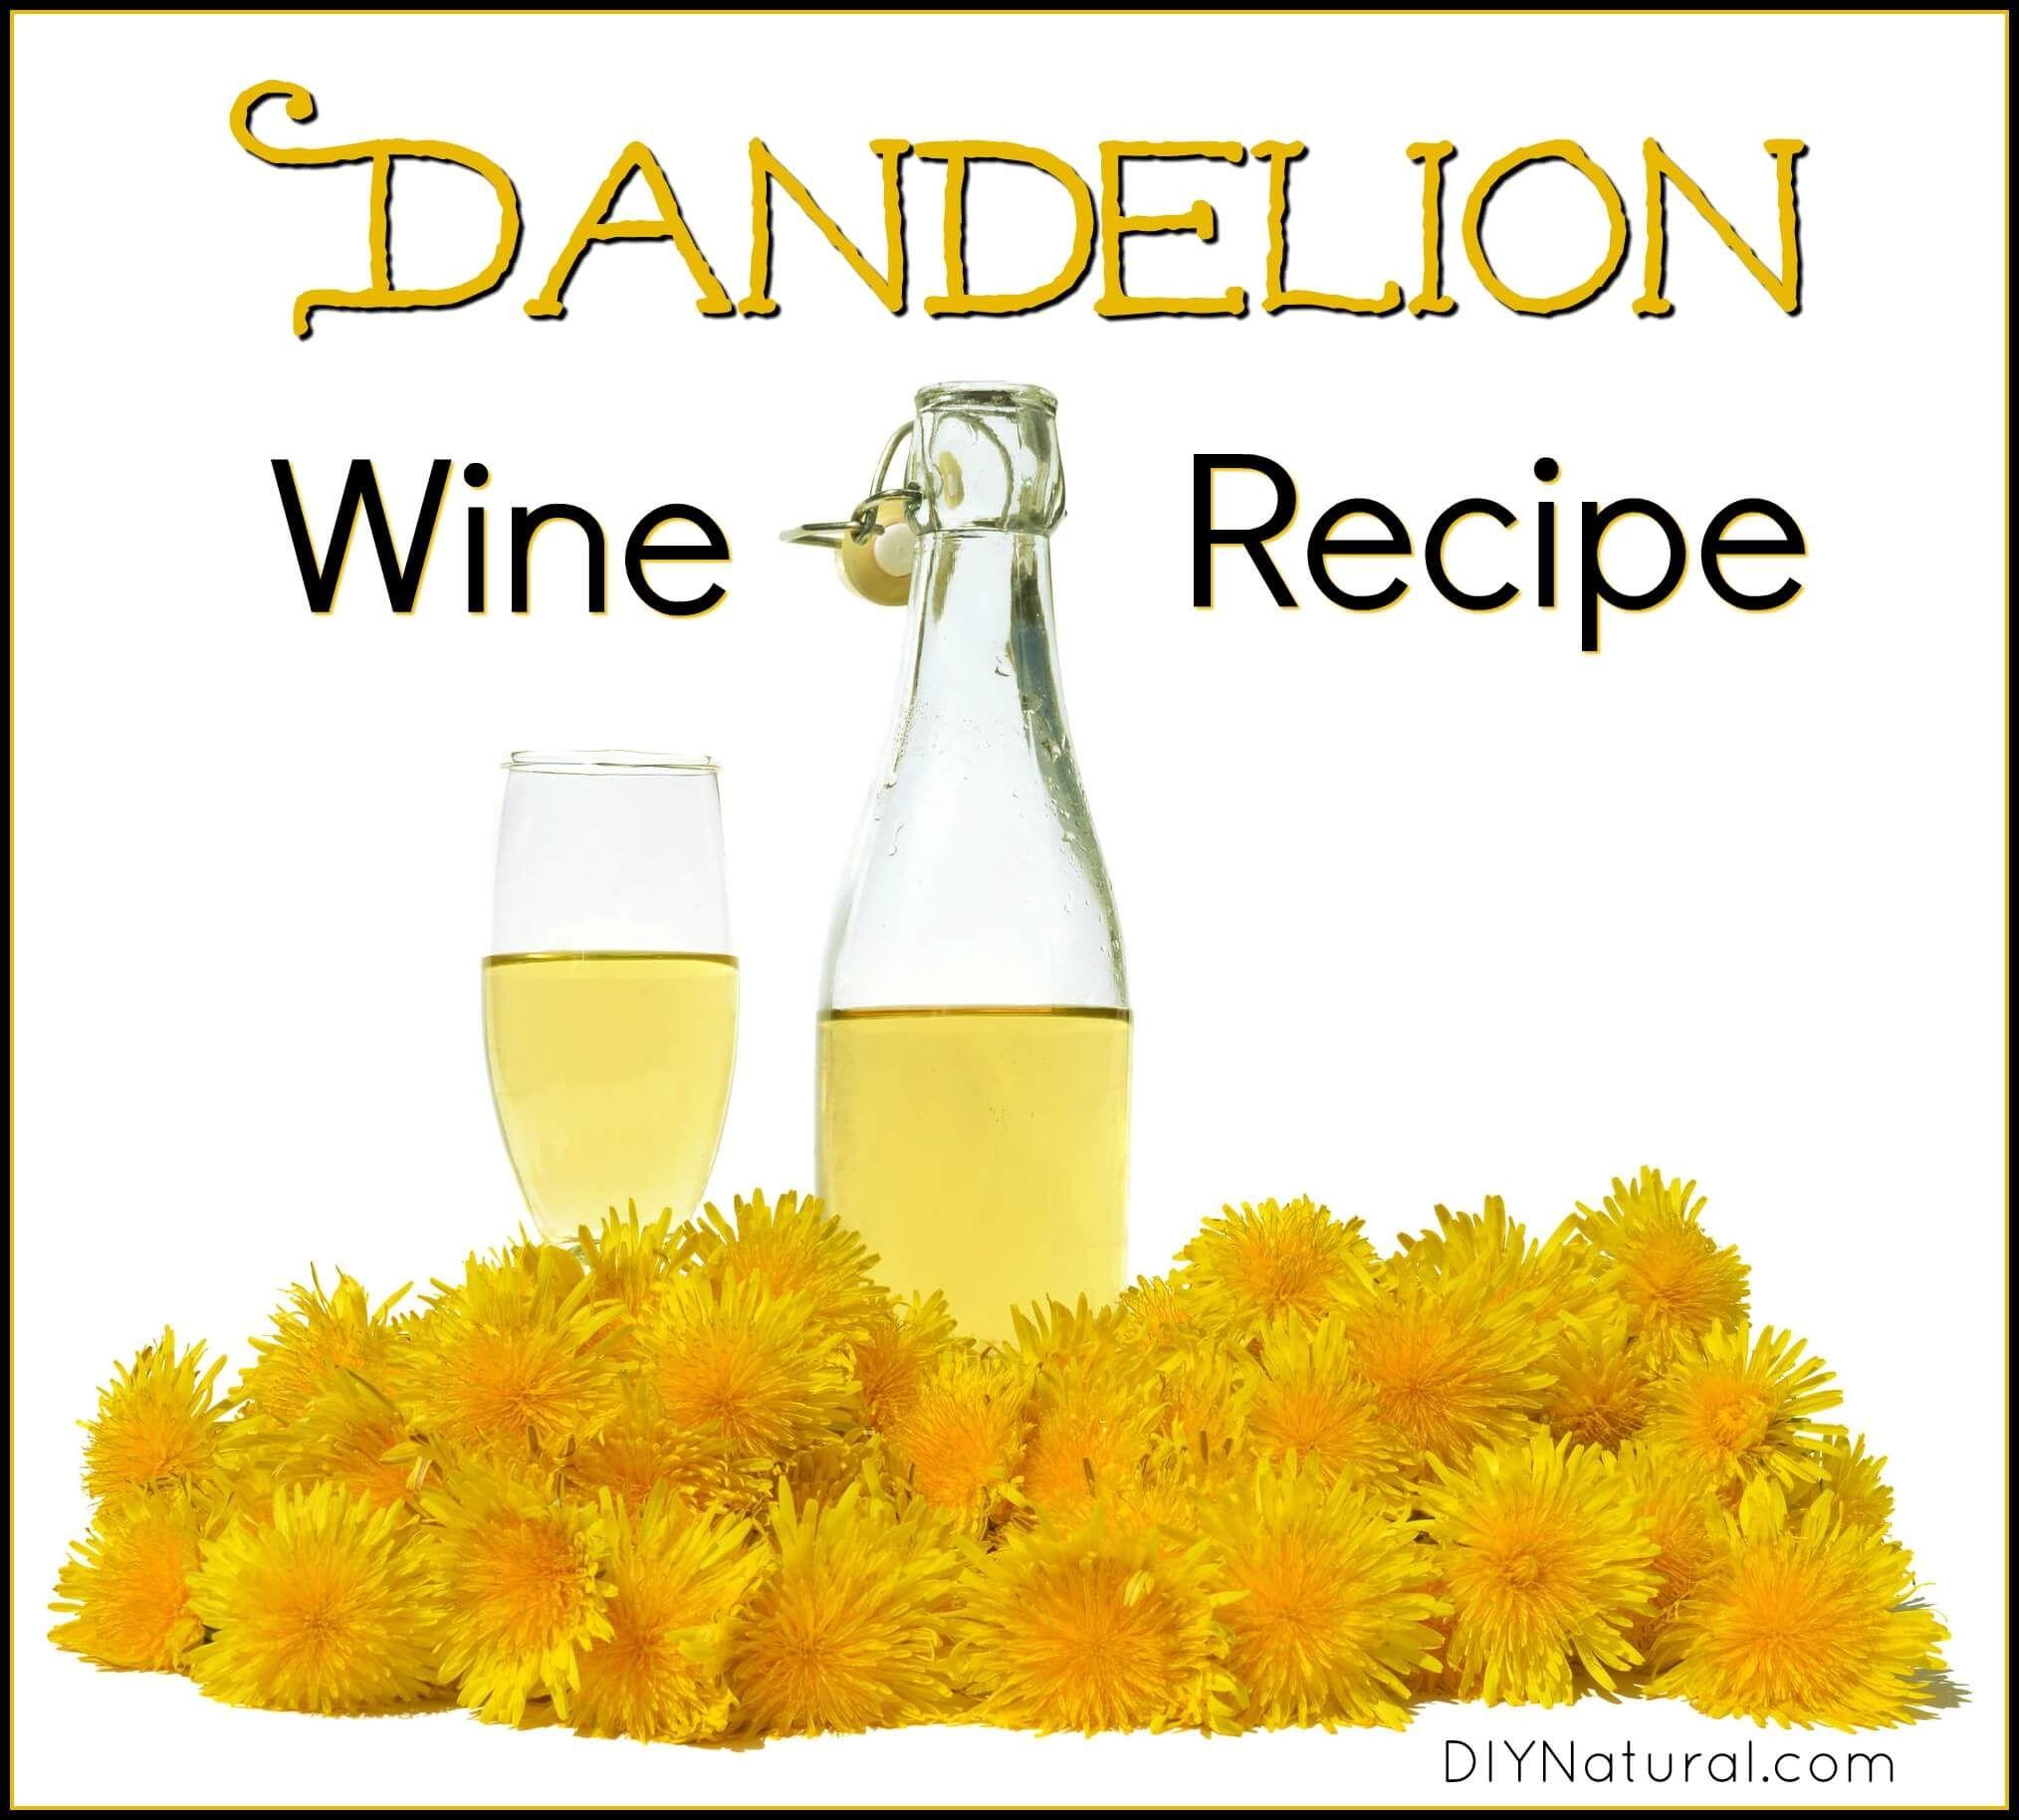 How to Make Dandelion Wine (Recipe) - WellPreserved